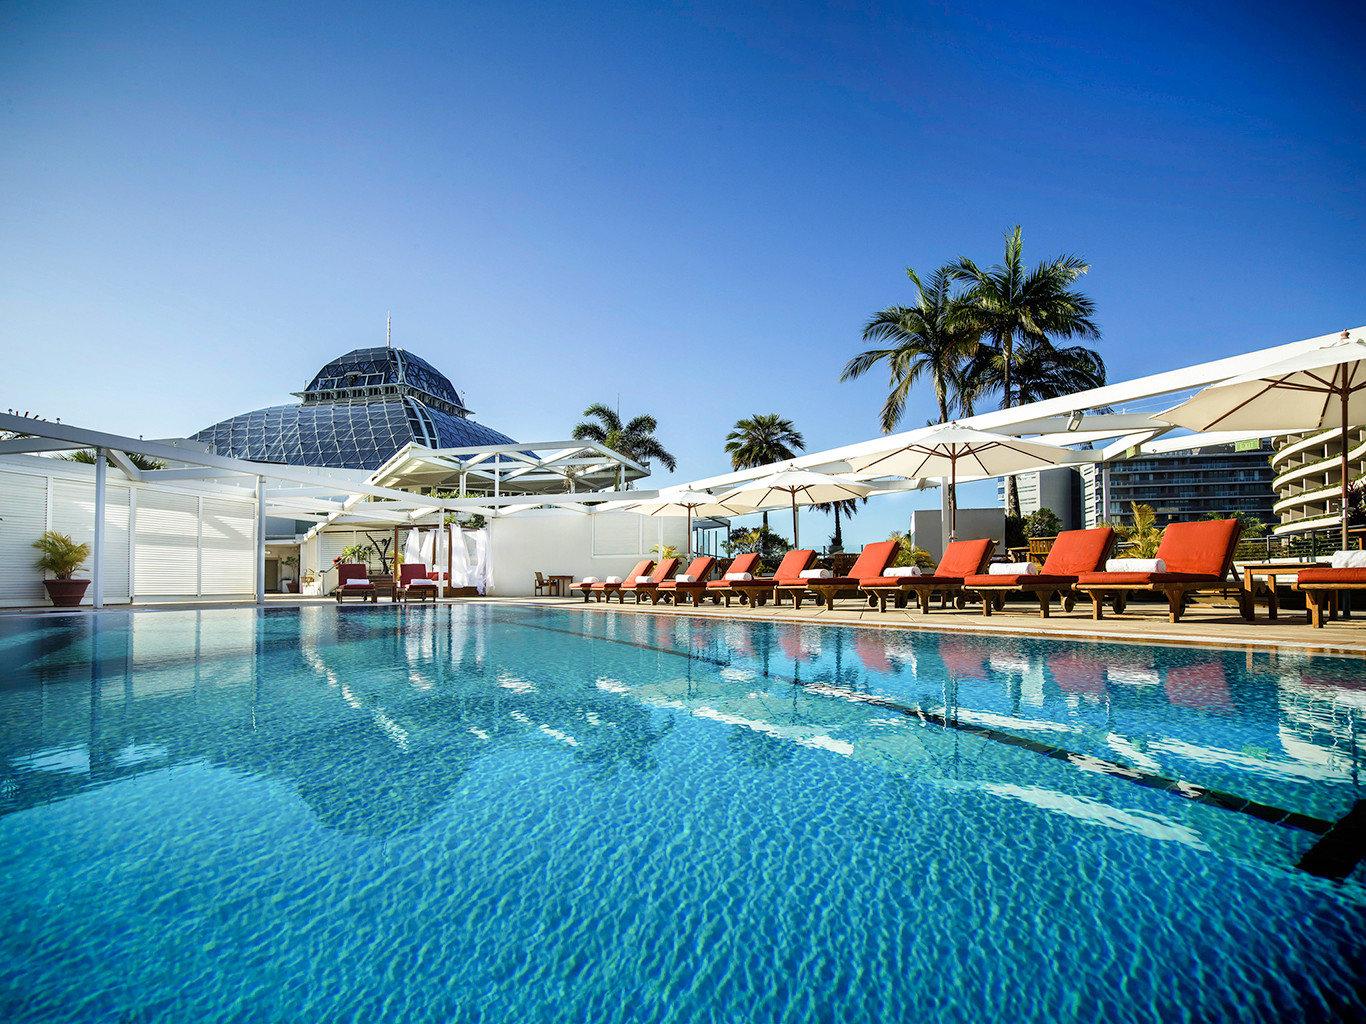 Buildings Play Pool Resort Scenic views sky swimming pool leisure marina resort town Sea dock blue